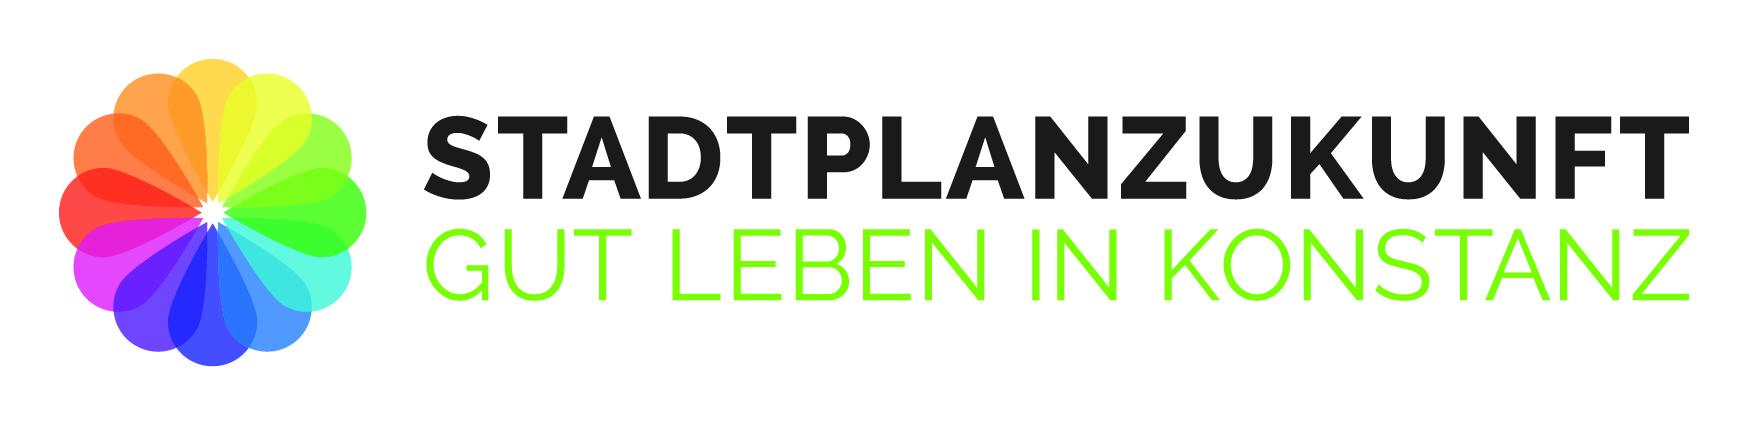 StadtplanZukunft_Logo_final2